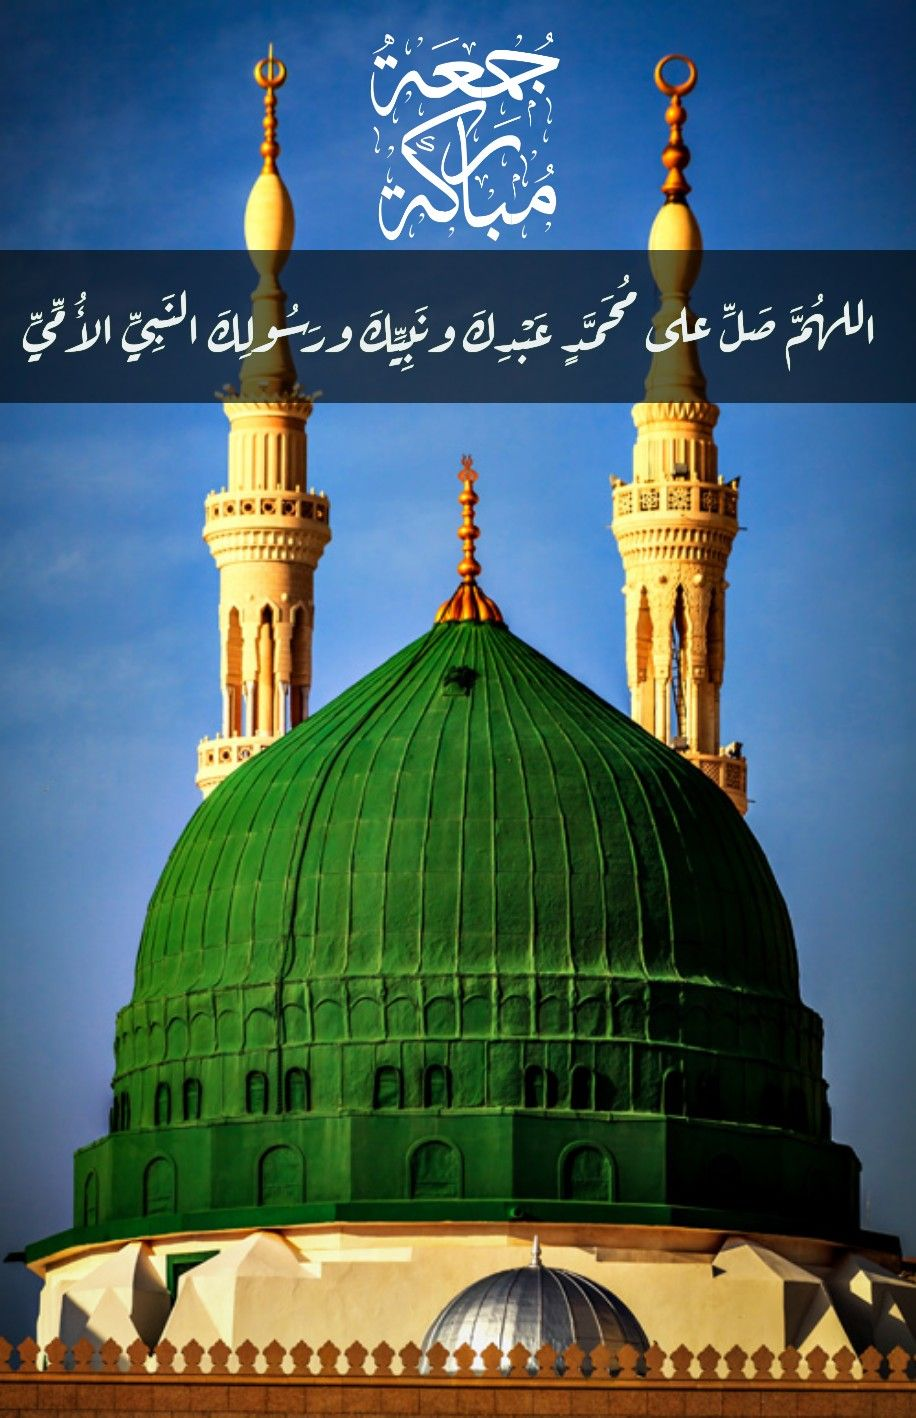 Madinah جمعة مباركة المدينة المنورة القبة الخضراء Masjid Haram Noble Quran Masjid